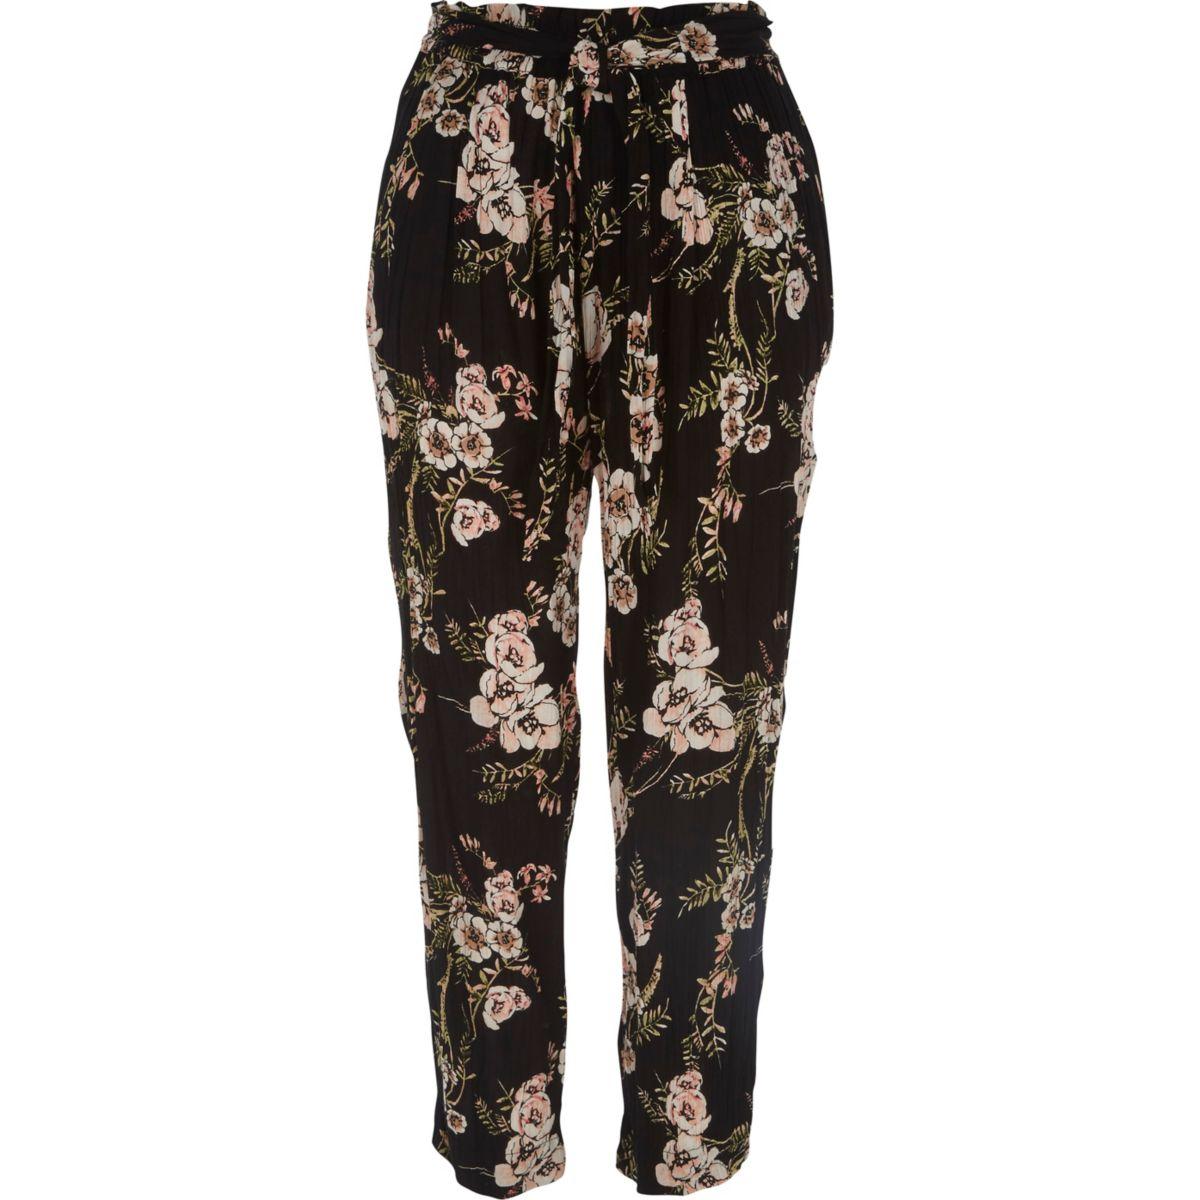 Black floral print loose fit trousers